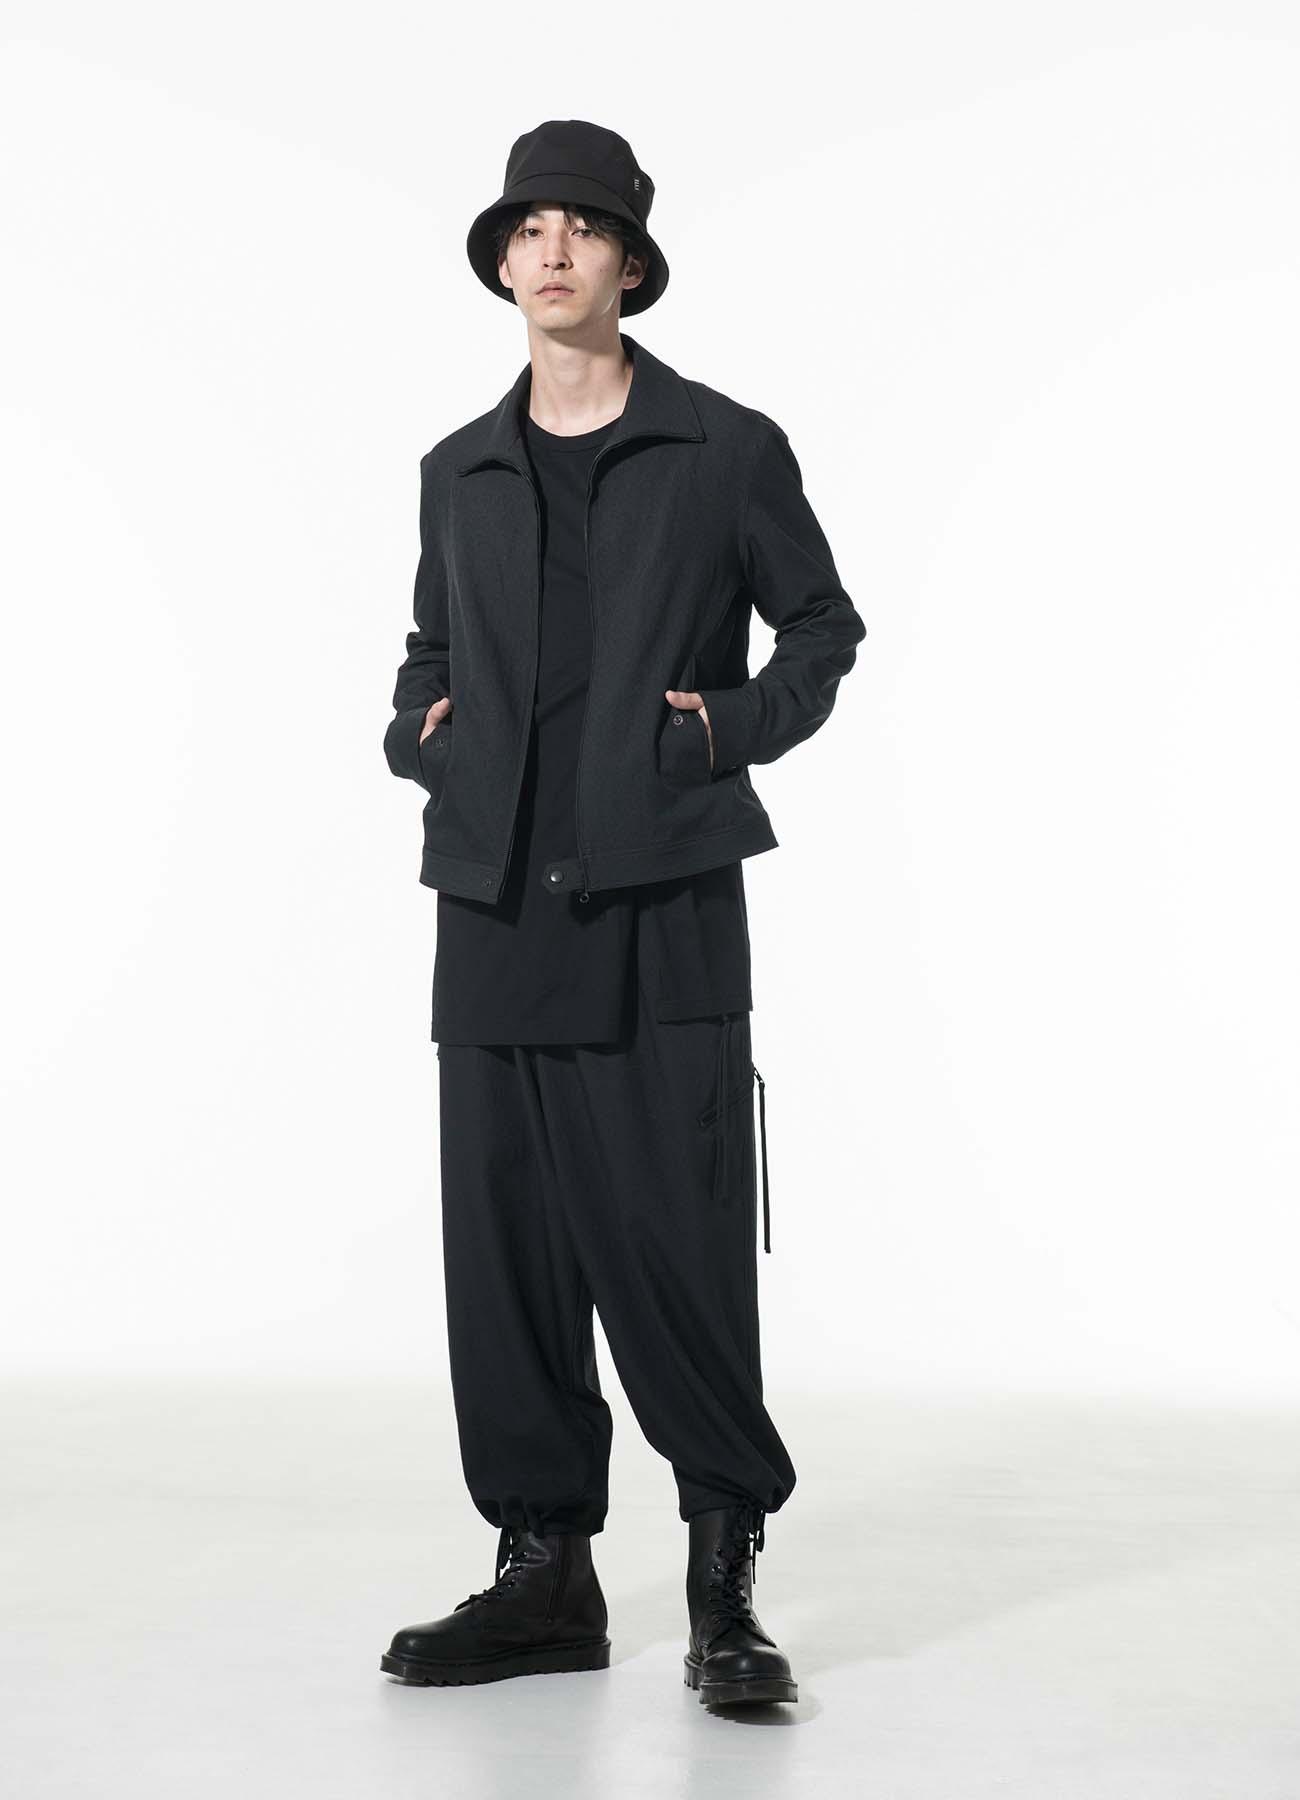 Shiwanoaru Polyester Stretch Twill Fastener Cargo Pants